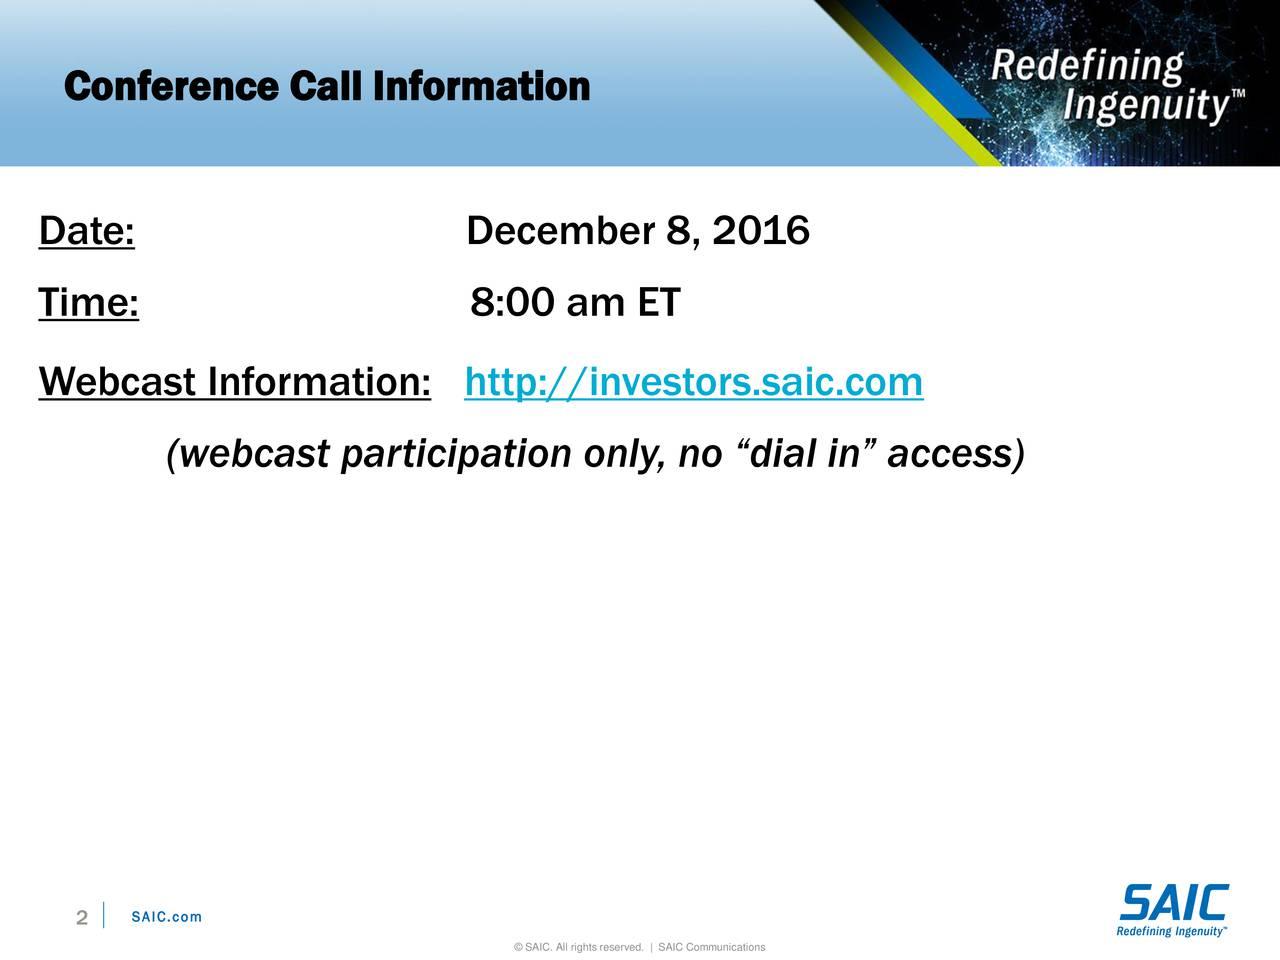 Date: December 8, 2016 Time: 8:00 am ET Webcast Information: http://investors.saic.com (webcast participation only, no dial in access) 2 SAIC.com